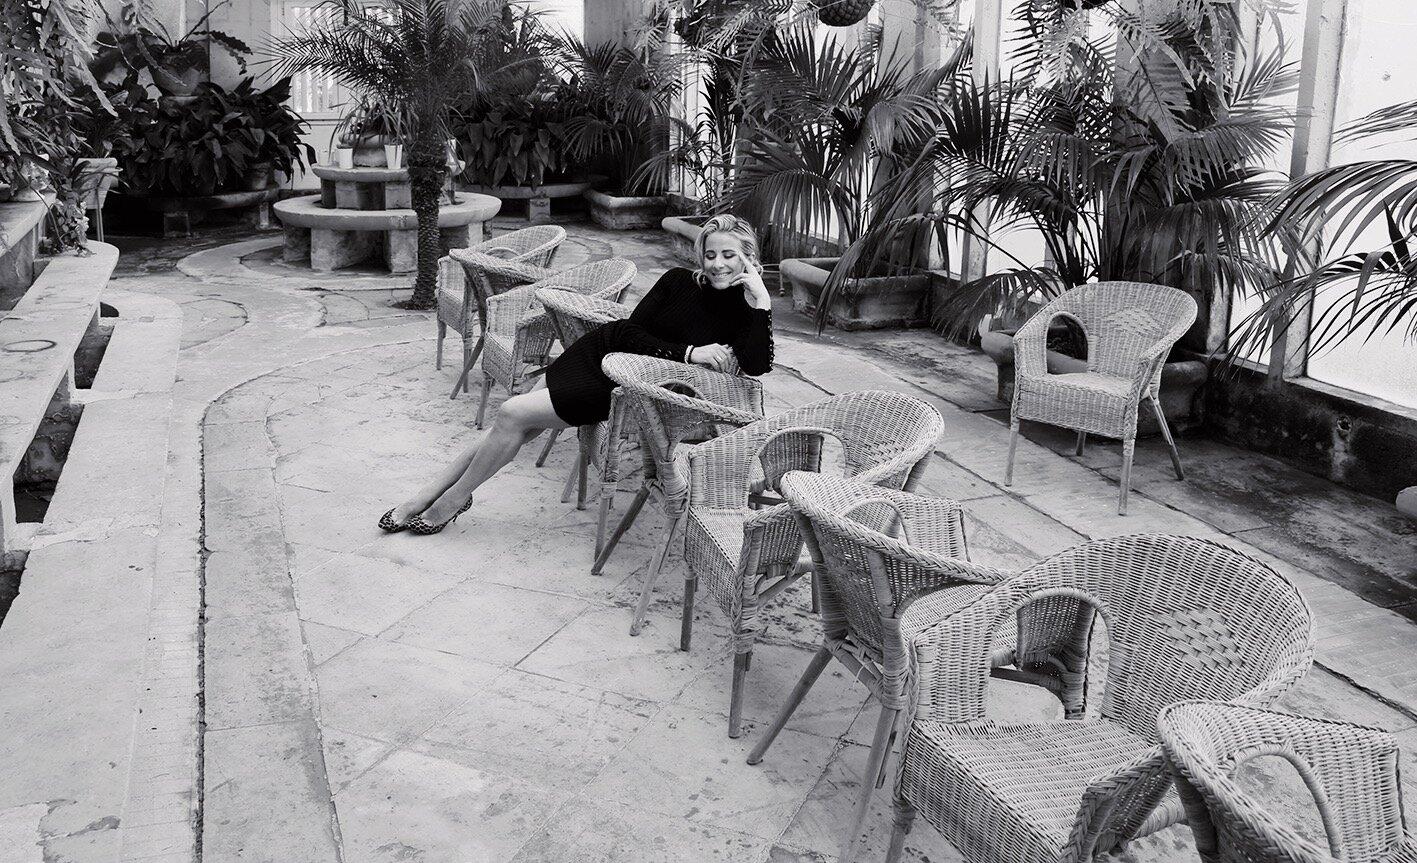 Art direction and photography. Justine Pergola, Palazzo Parisio.